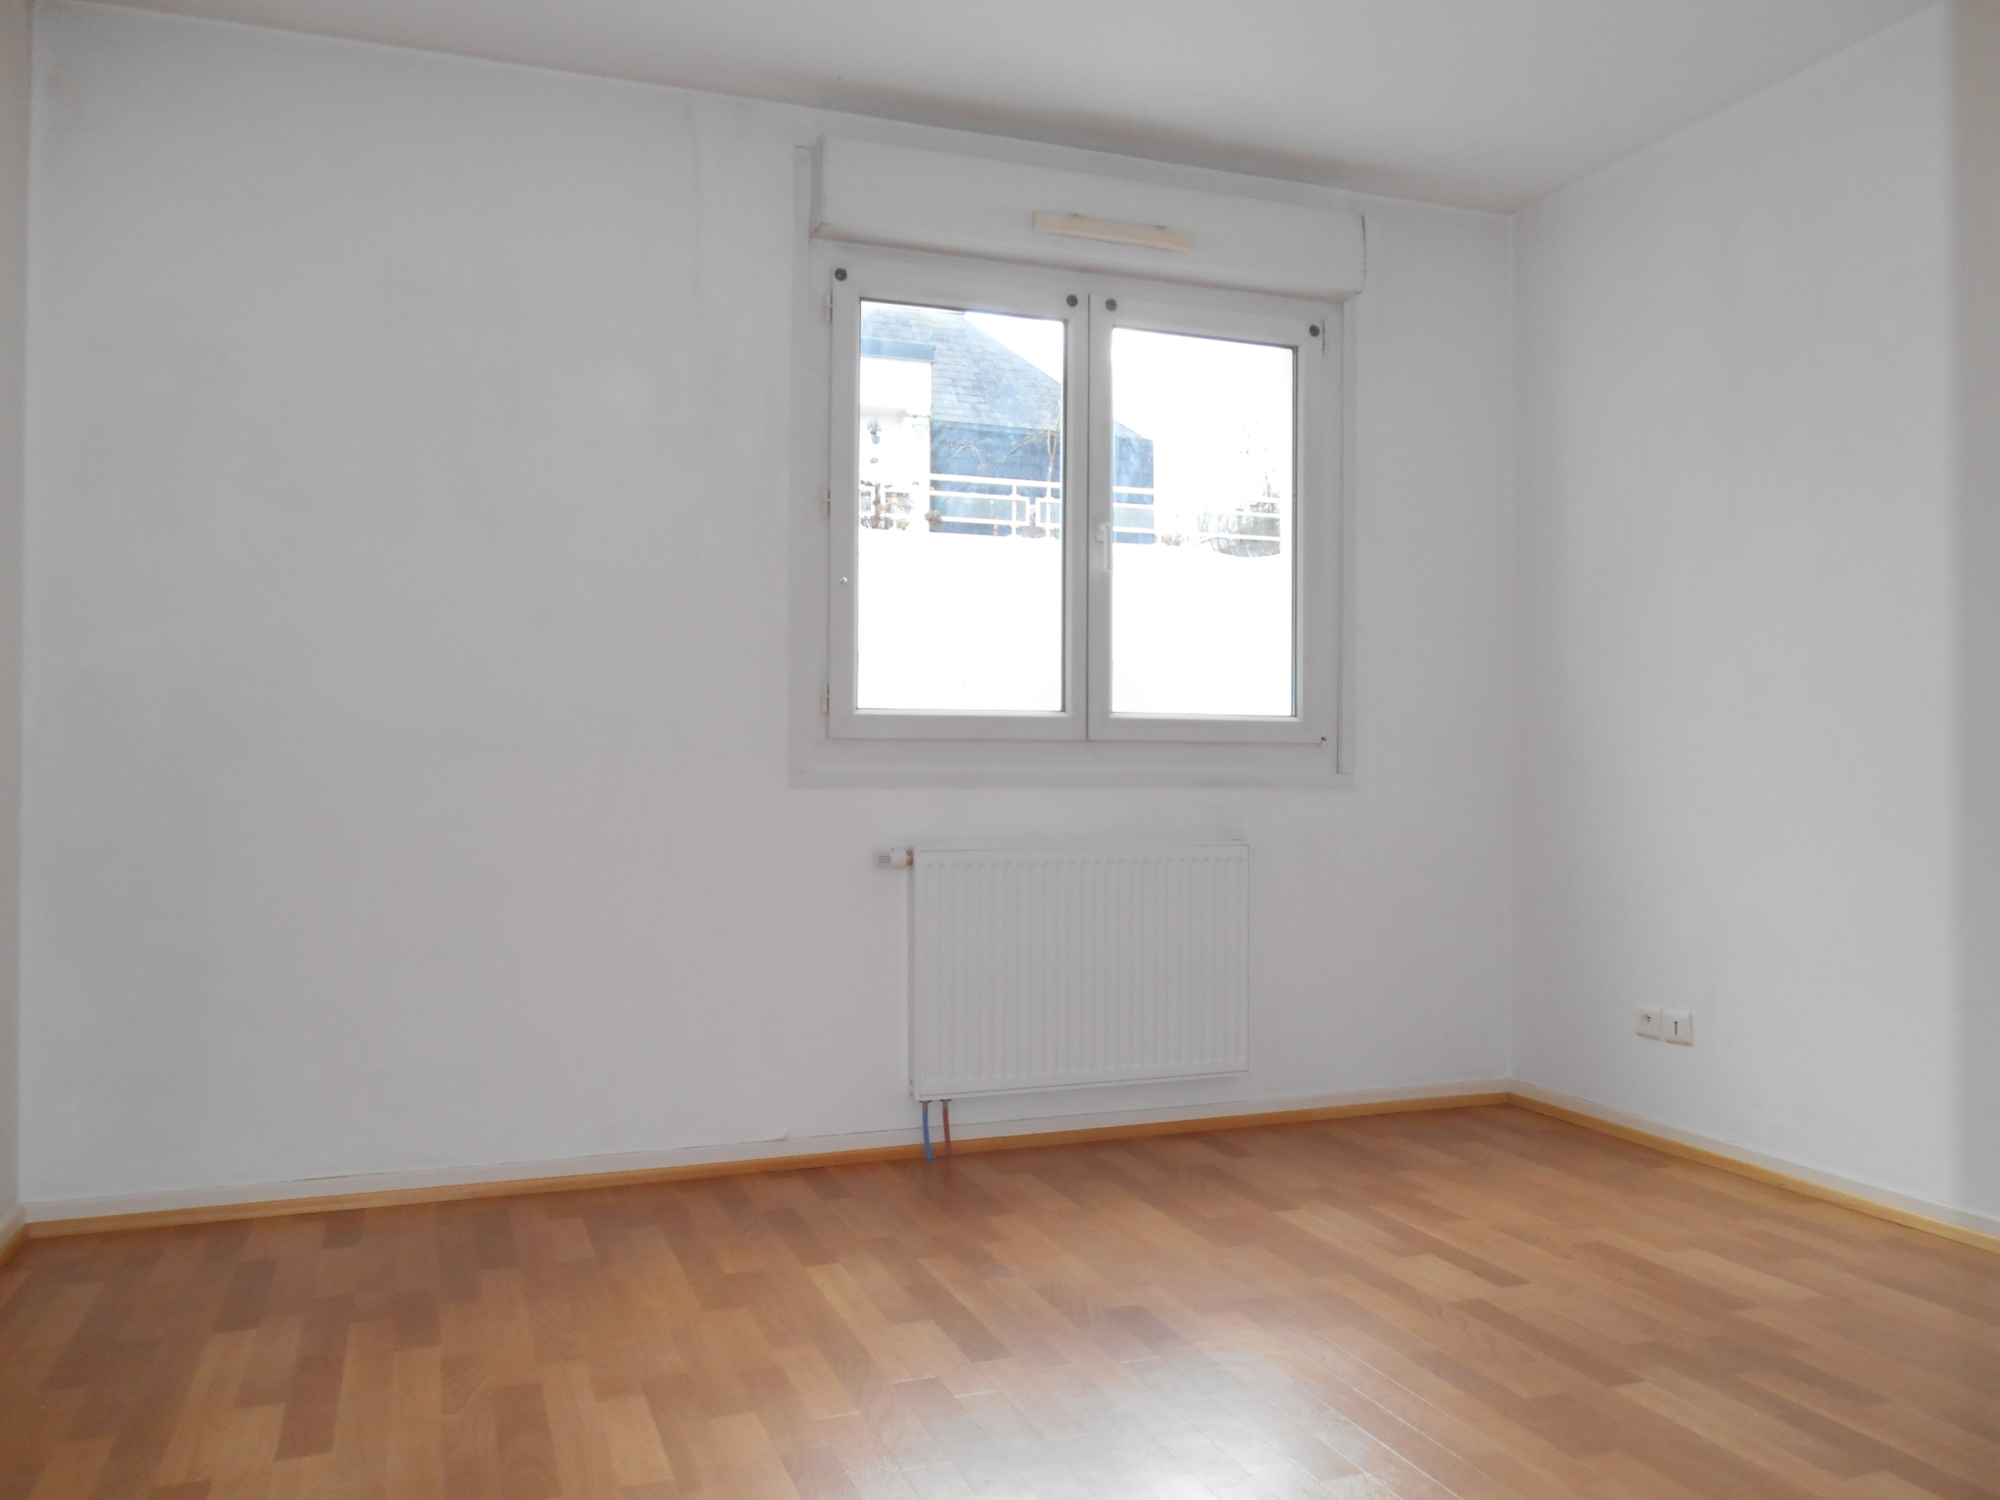 [Président] Grand 3 pièces – Orangerie / Av. Schumann - nos locations - Beausite Immobilier 4